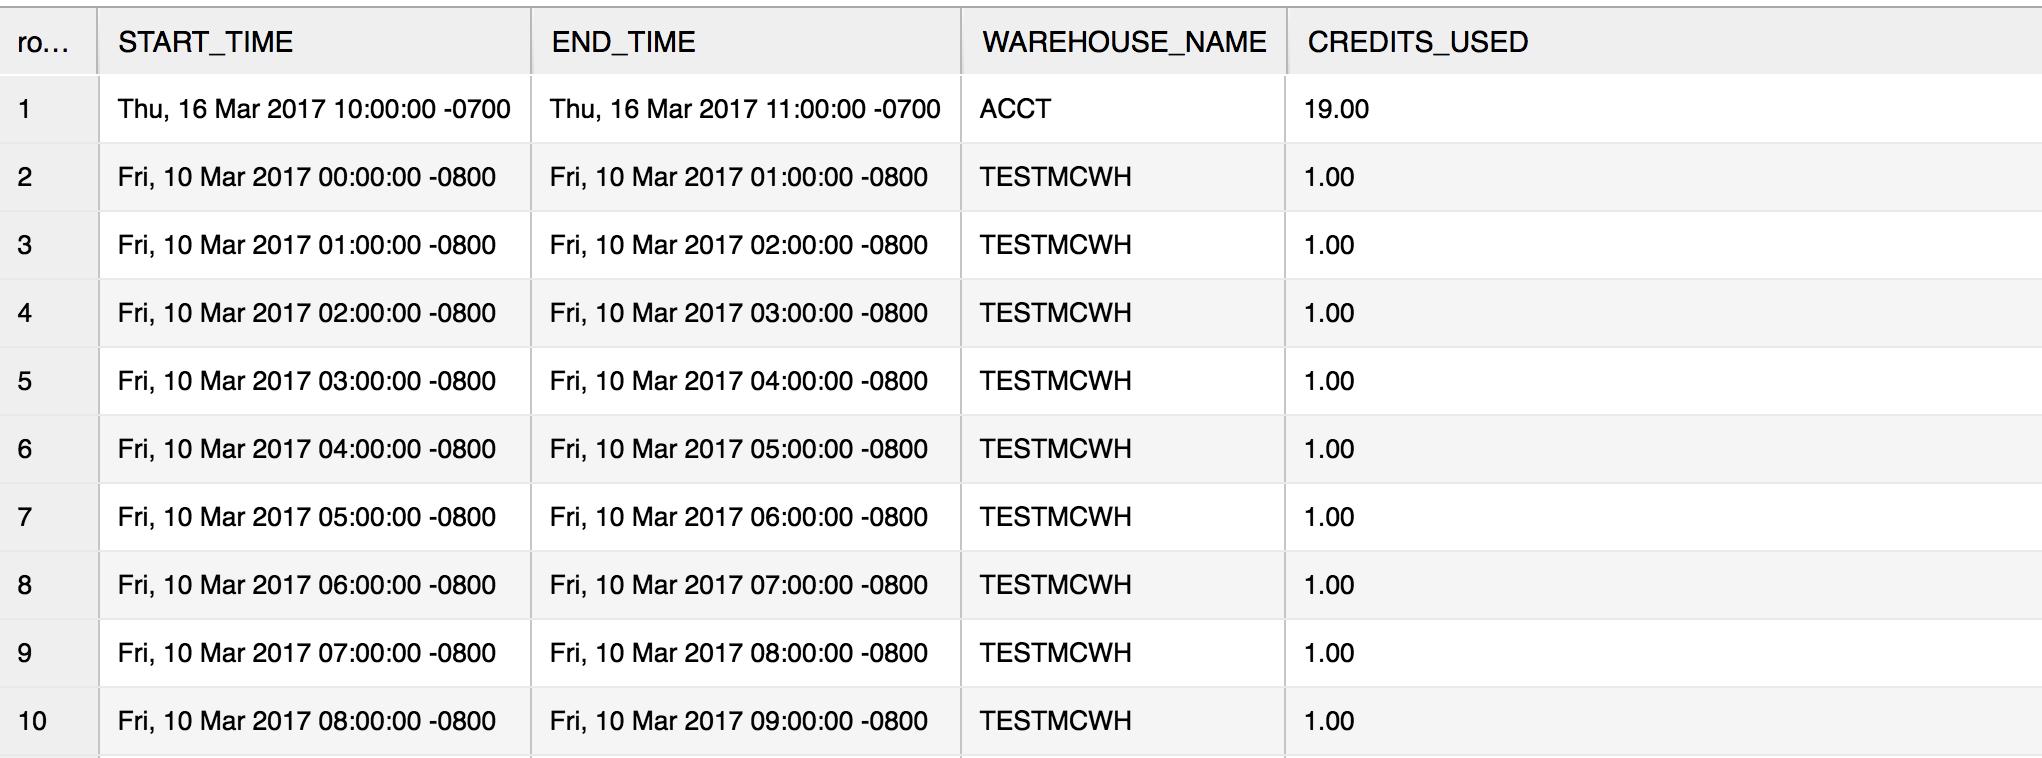 Looking at Warehouse Metering History